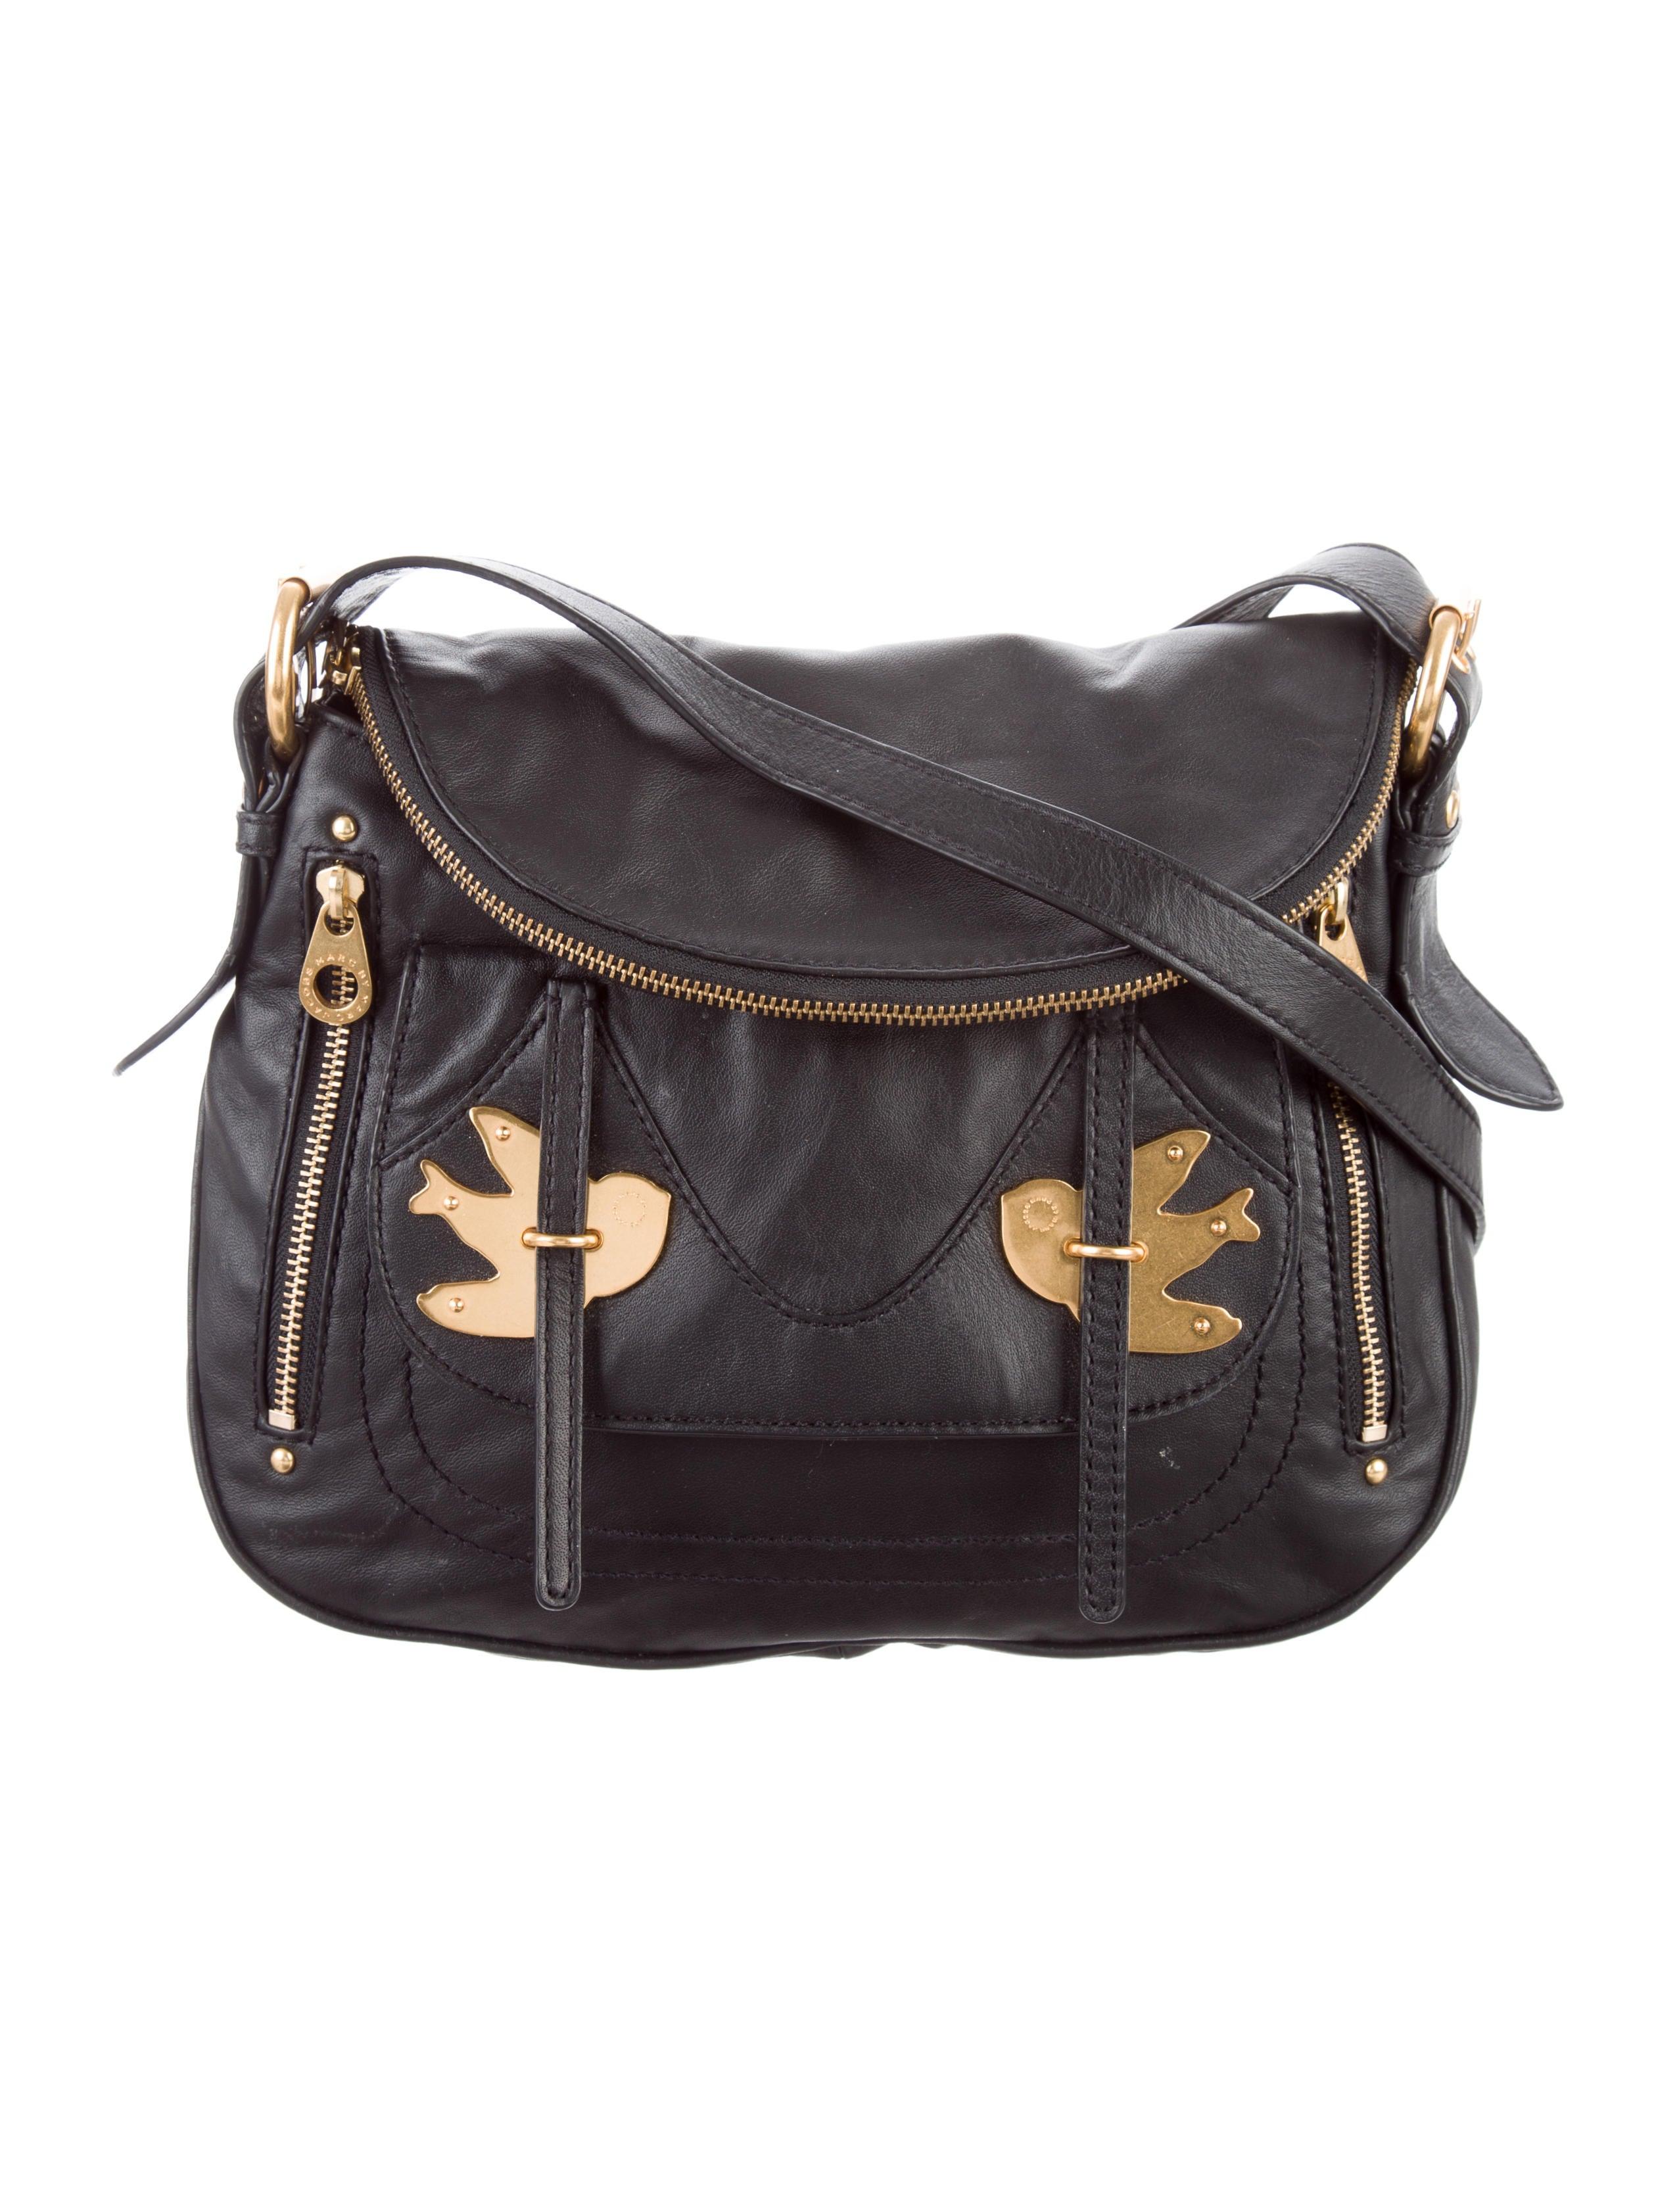 Petal To The Metal Natasha Bag